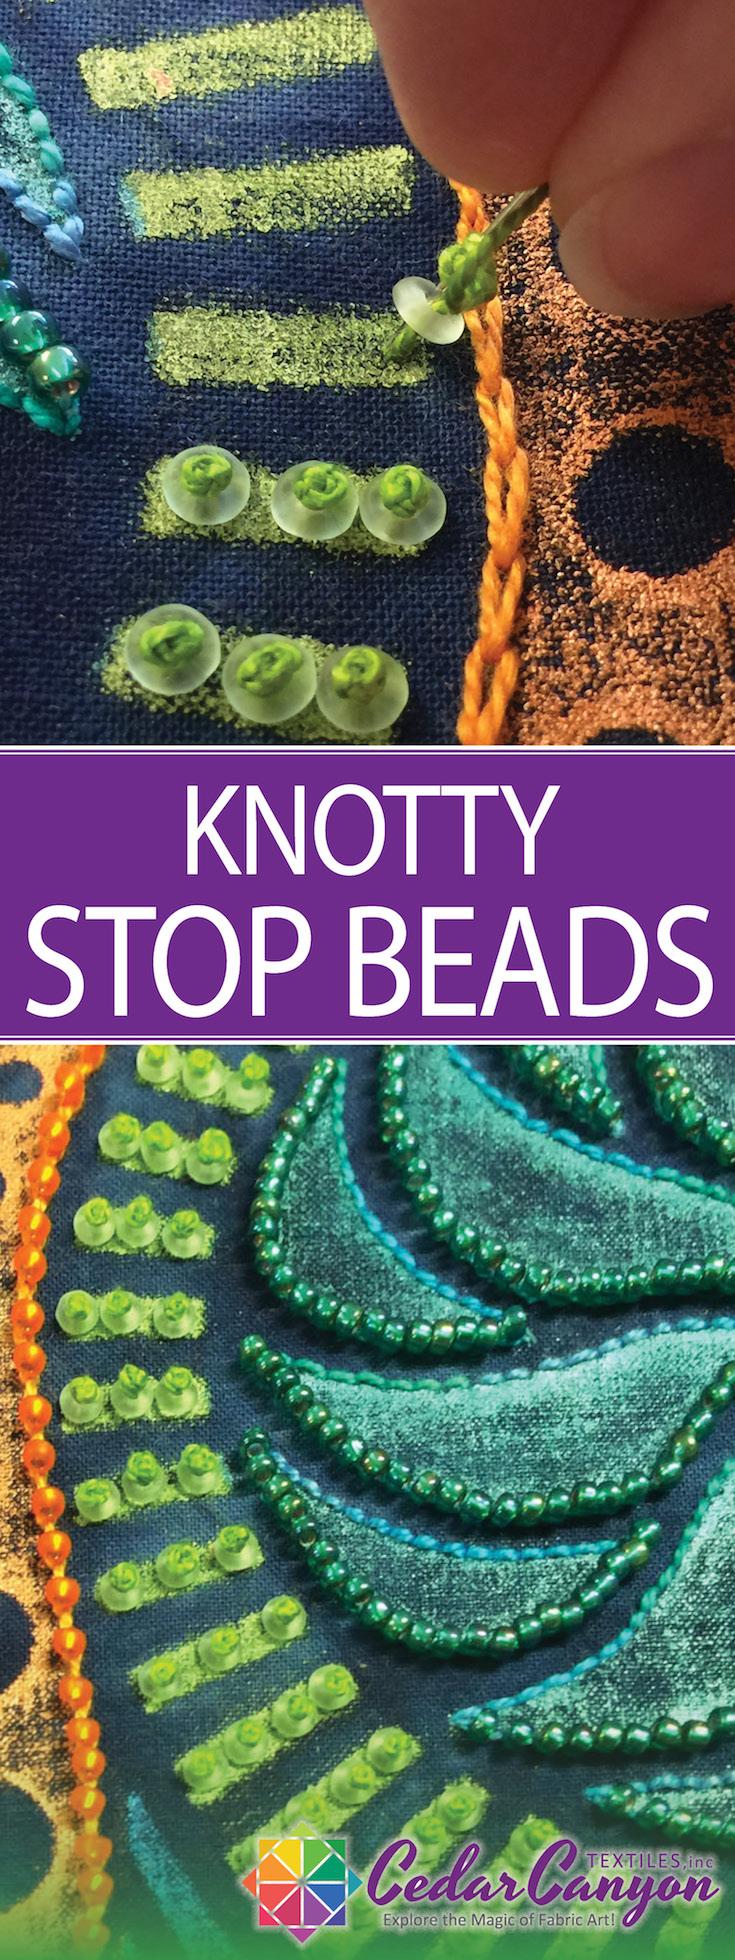 Knotty Stop Beads